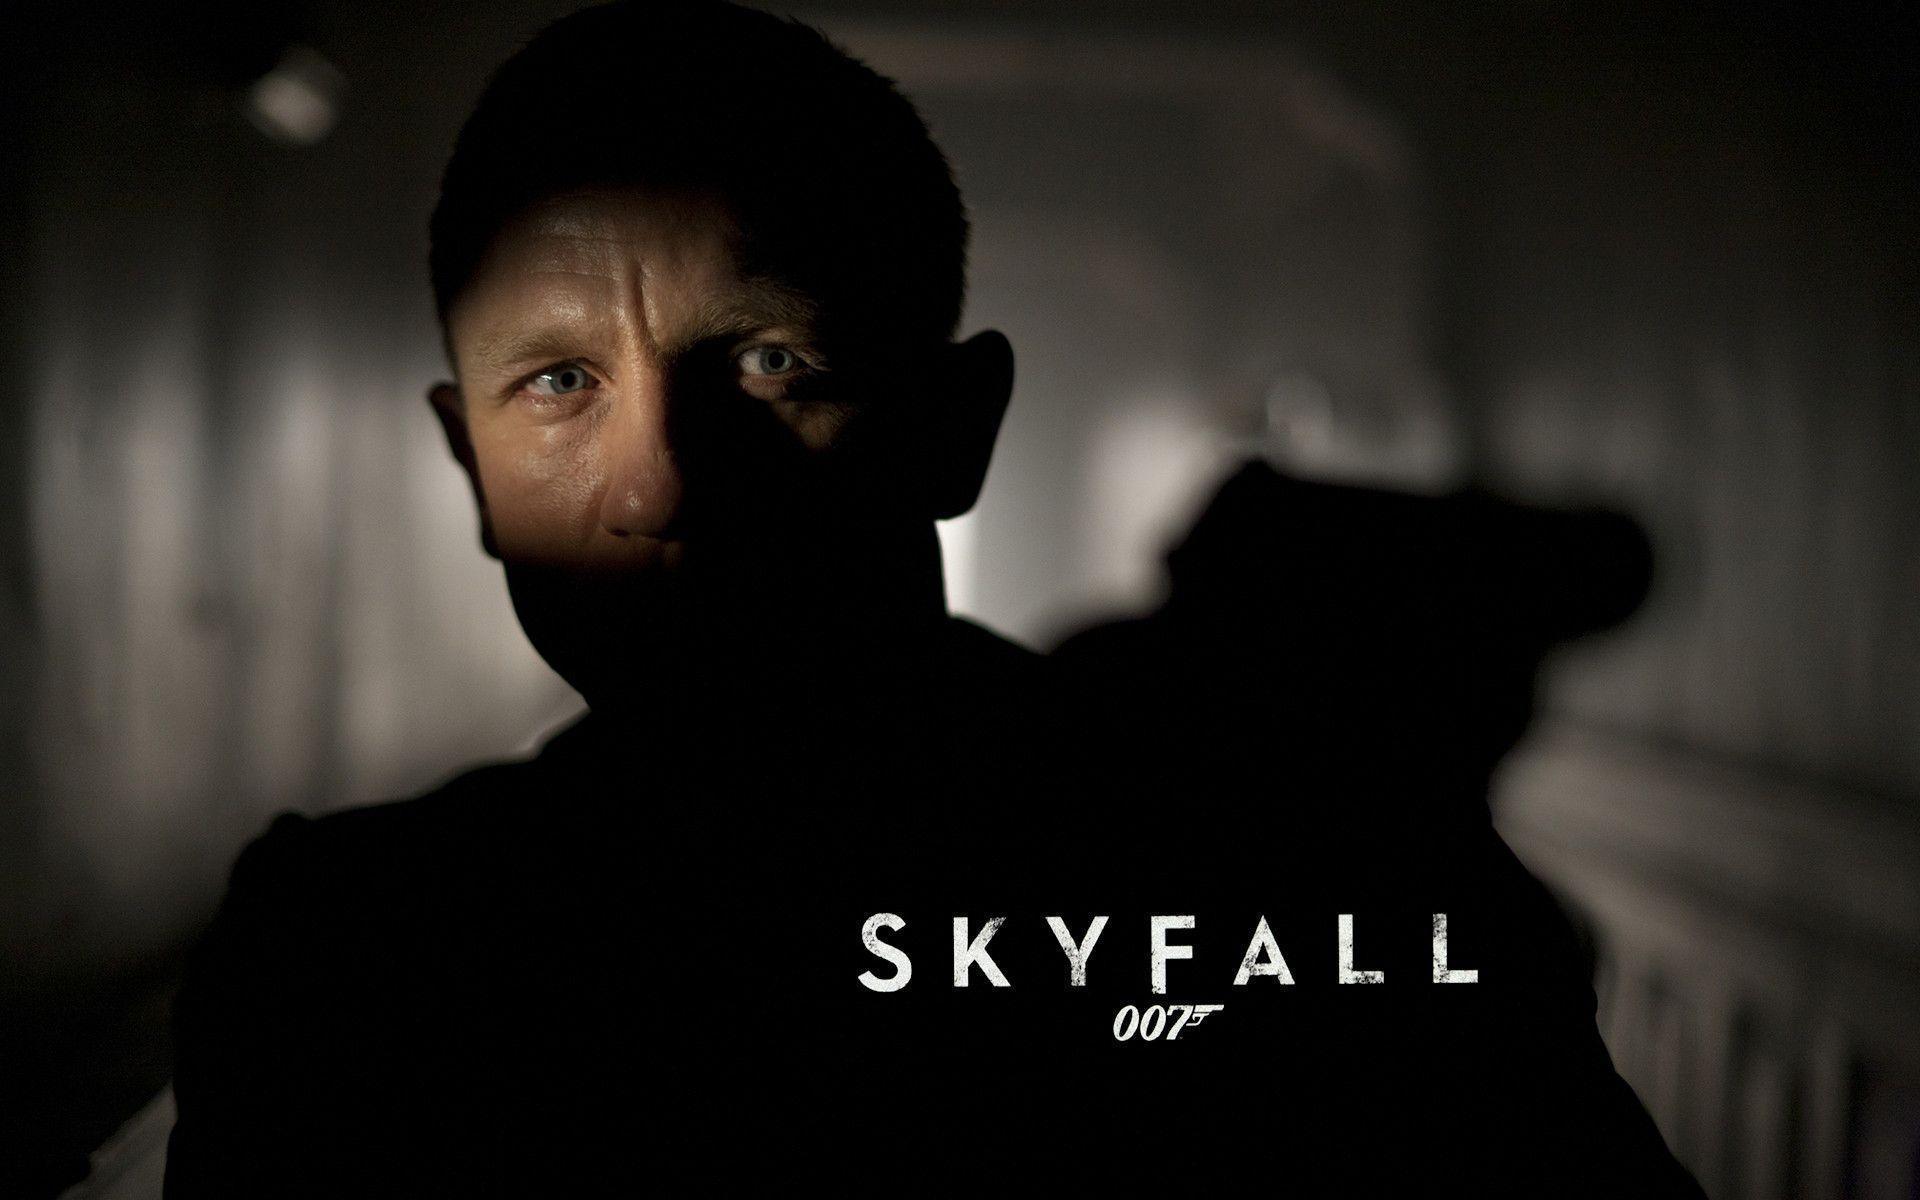 James Bond 007 Wallpapers - Wallpaper Cave